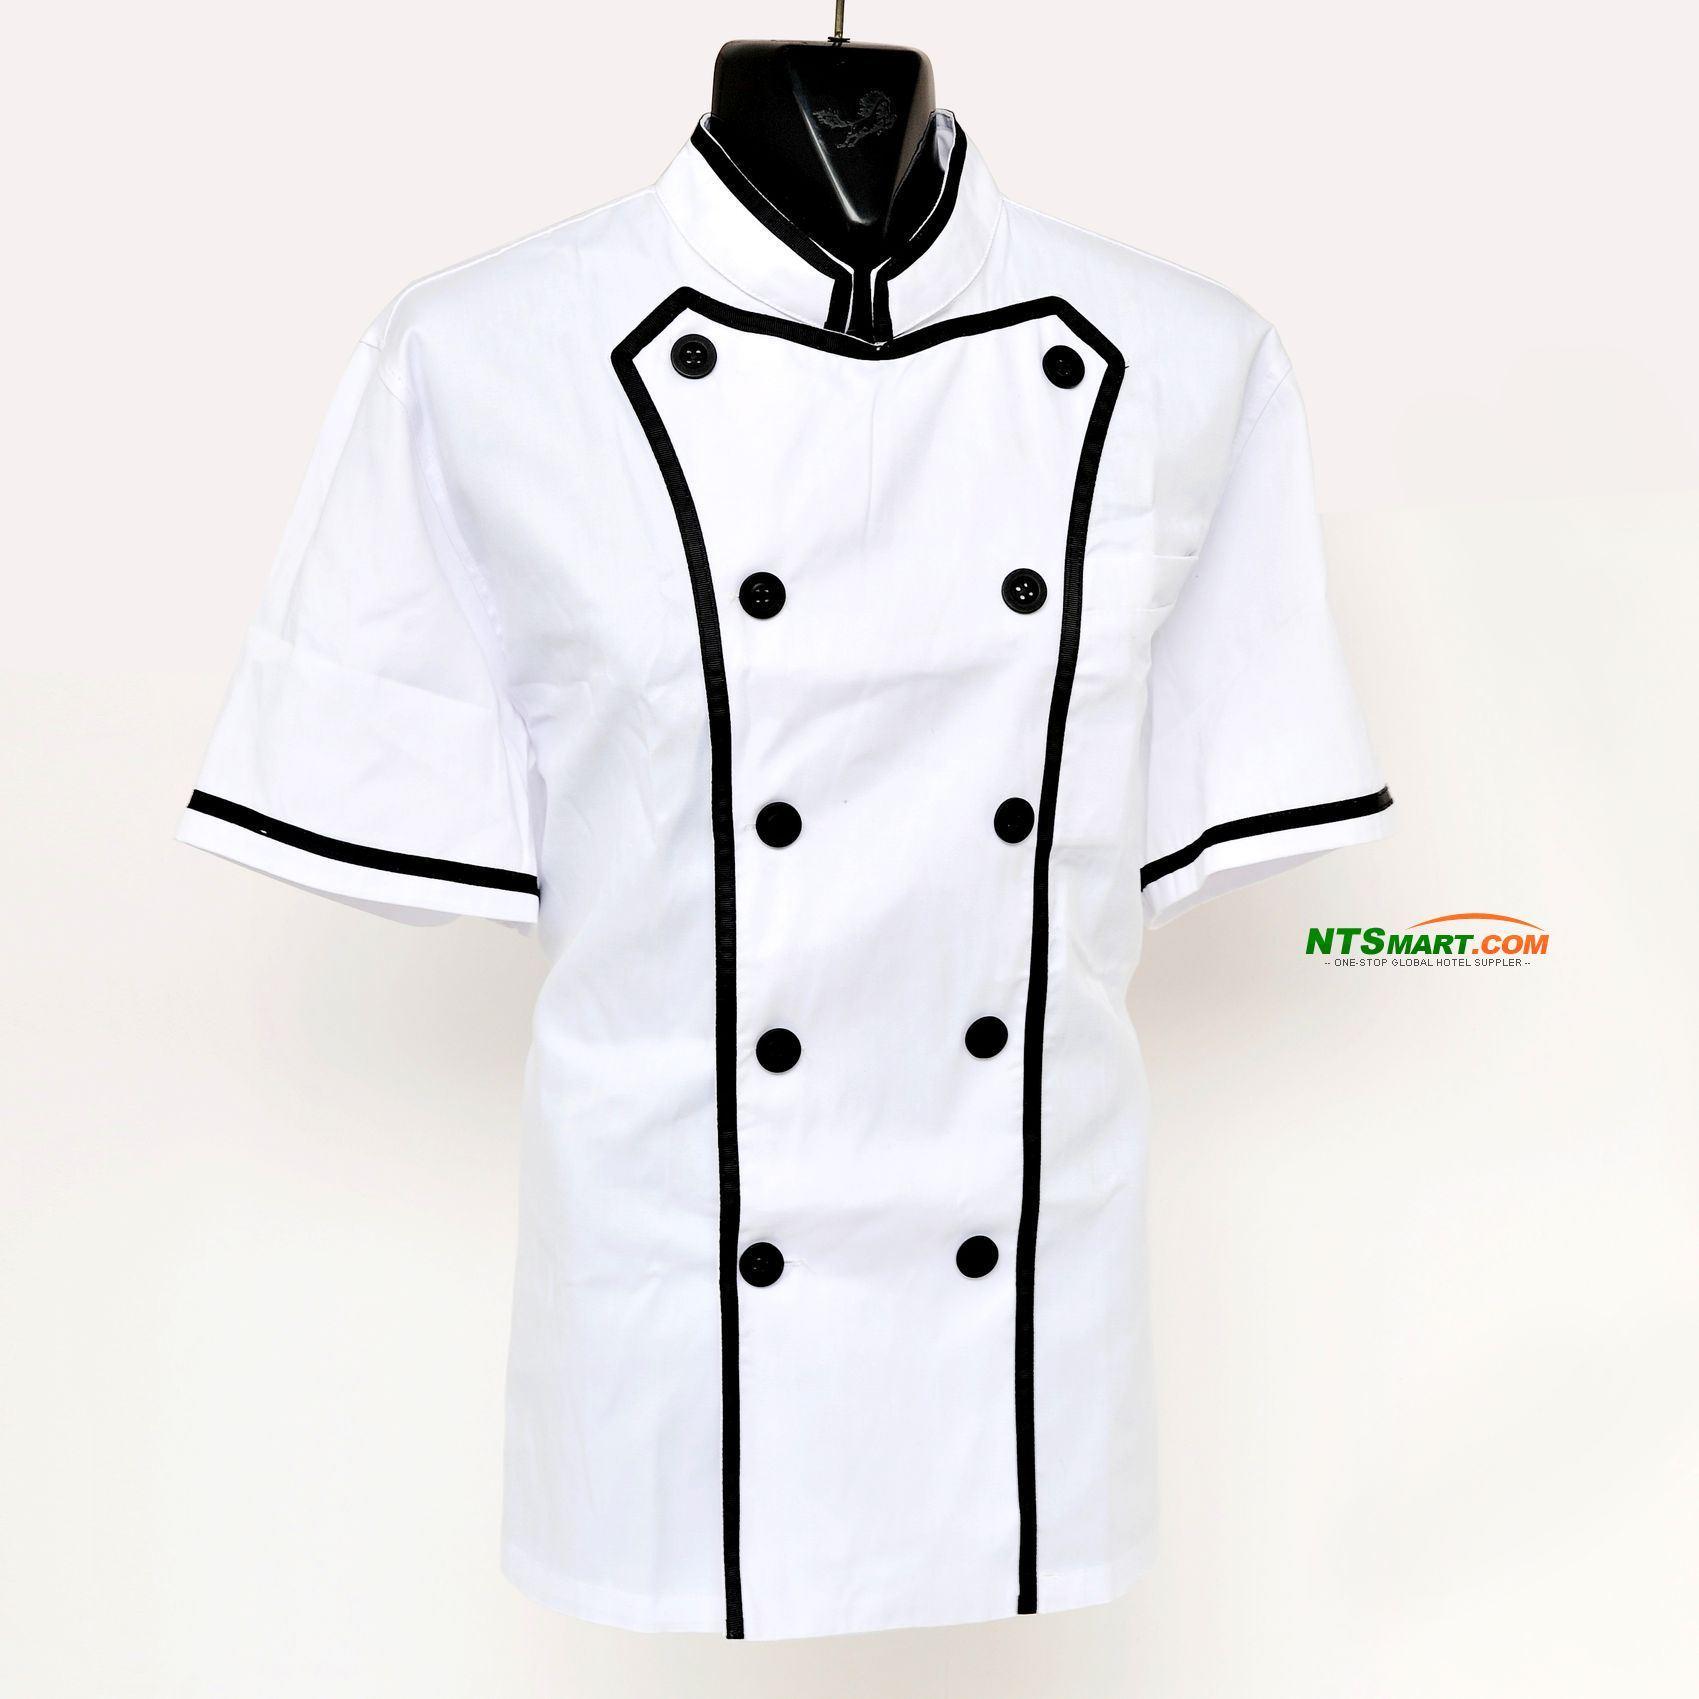 Hotels uniforms catalog images for Hotel design jersey